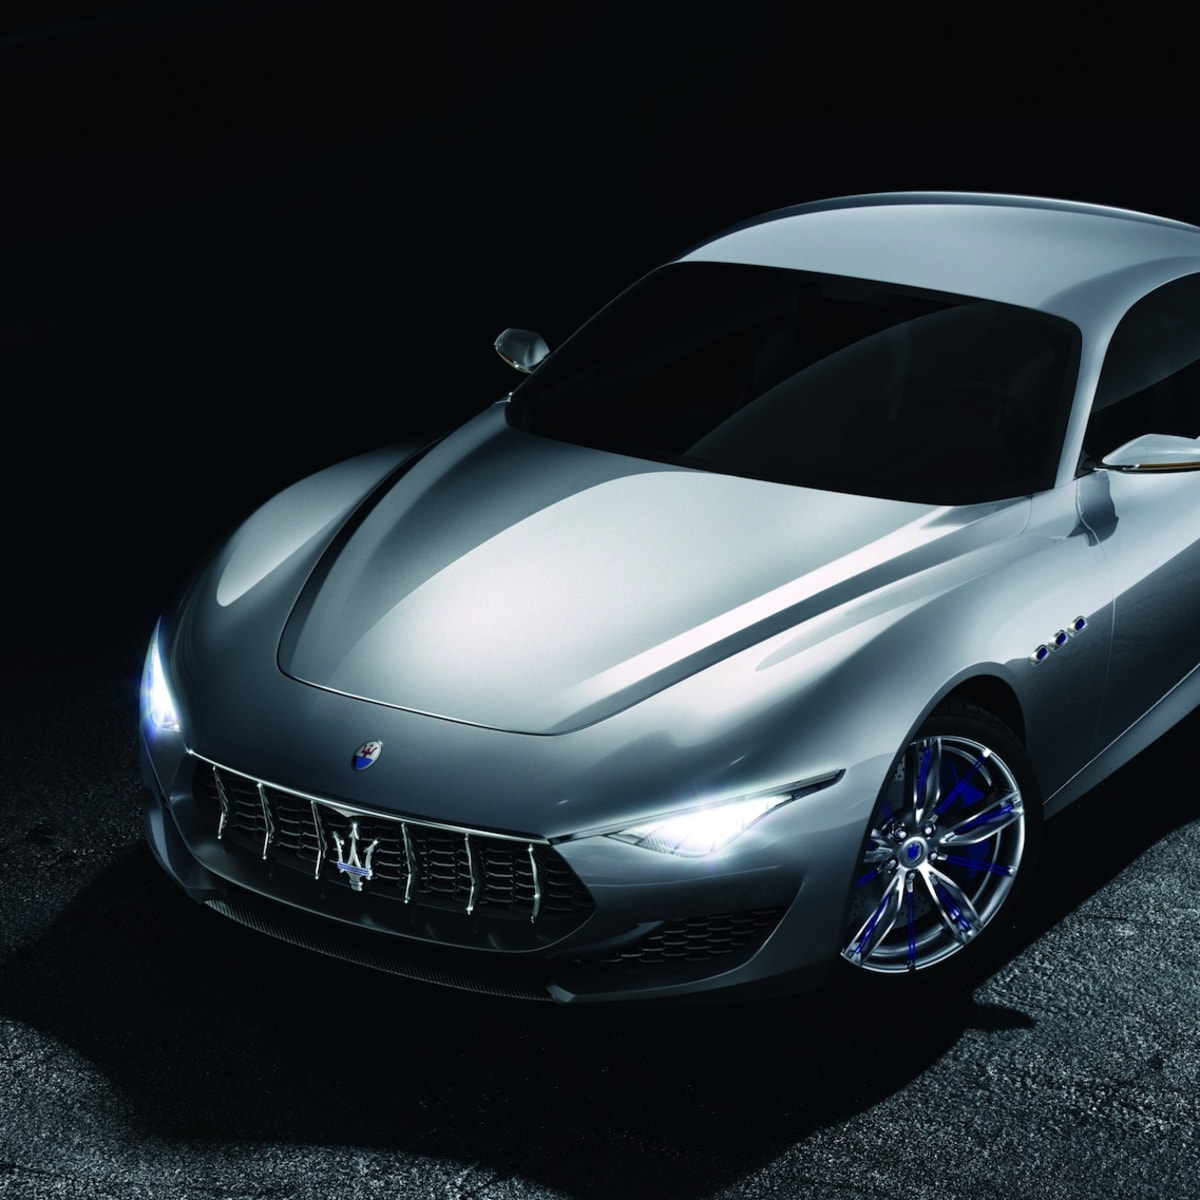 Maserati Alfieri On Hold Until 2020 Next Granturismo Due In 2018